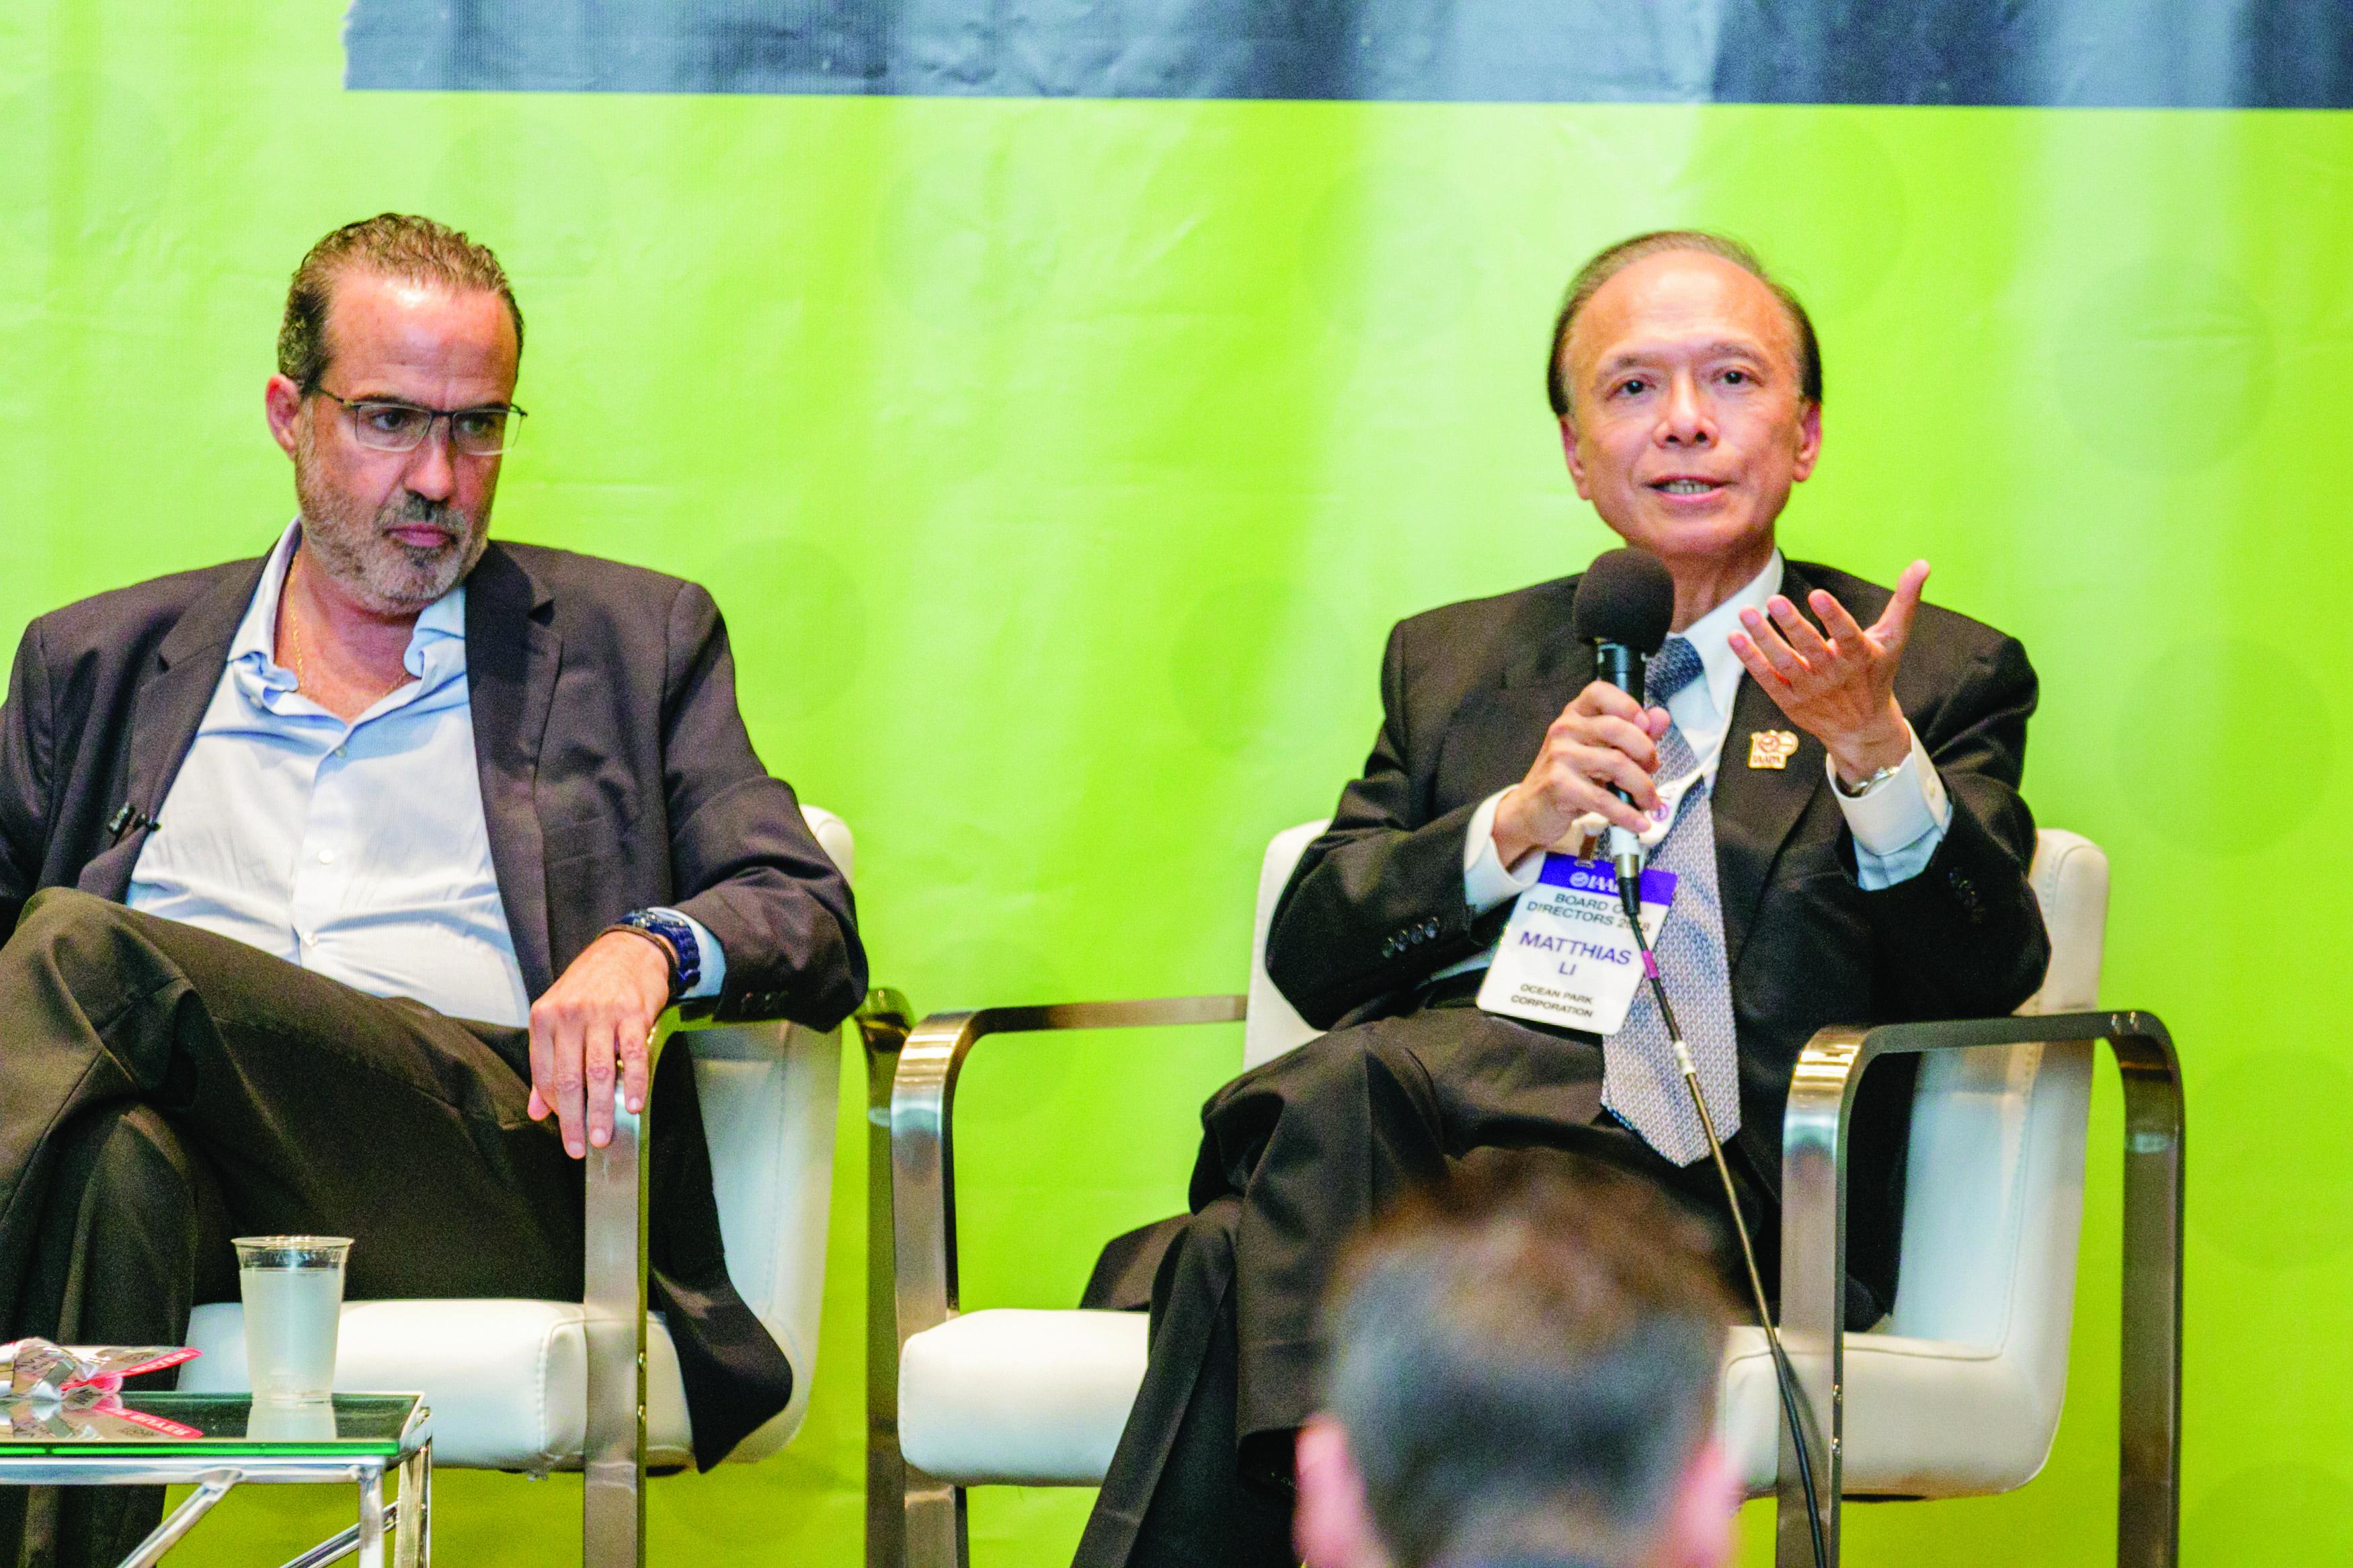 IAAPA CEOs 20107 Xavier Lopez Ancona and Matthias Li